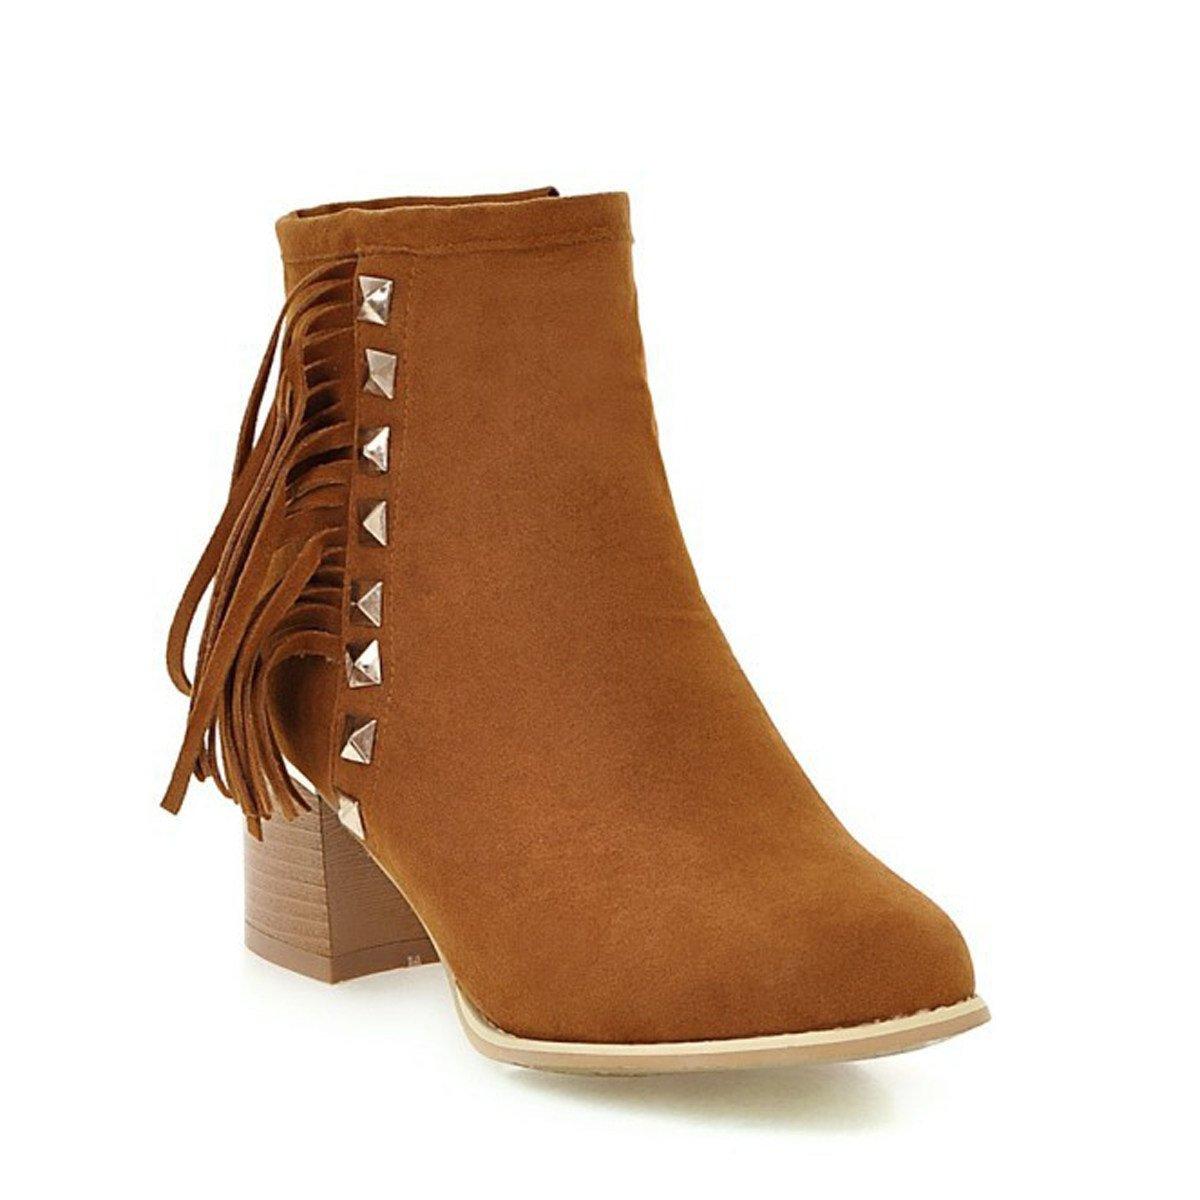 WJNKK Mesdames Chunky Chunky Chunky Block Heel Zipper Bottines Chaussures CasualB076FSHKWNParent 9854fd